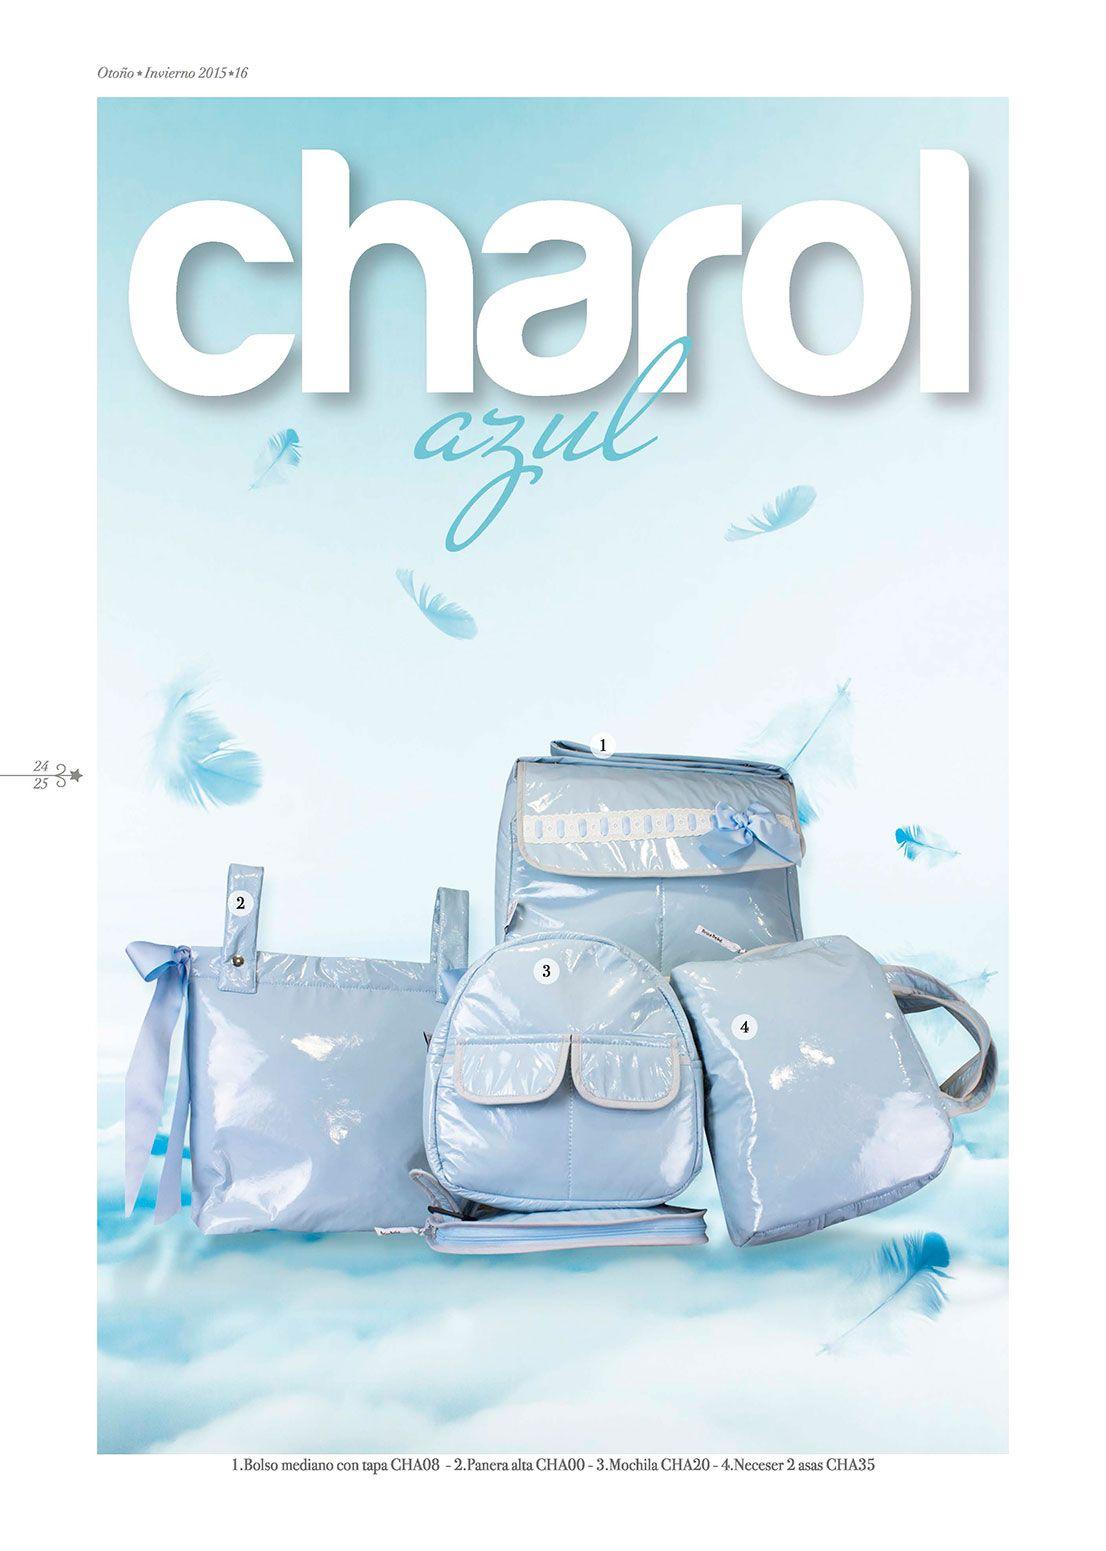 CHAROL-azul-Brisabebe